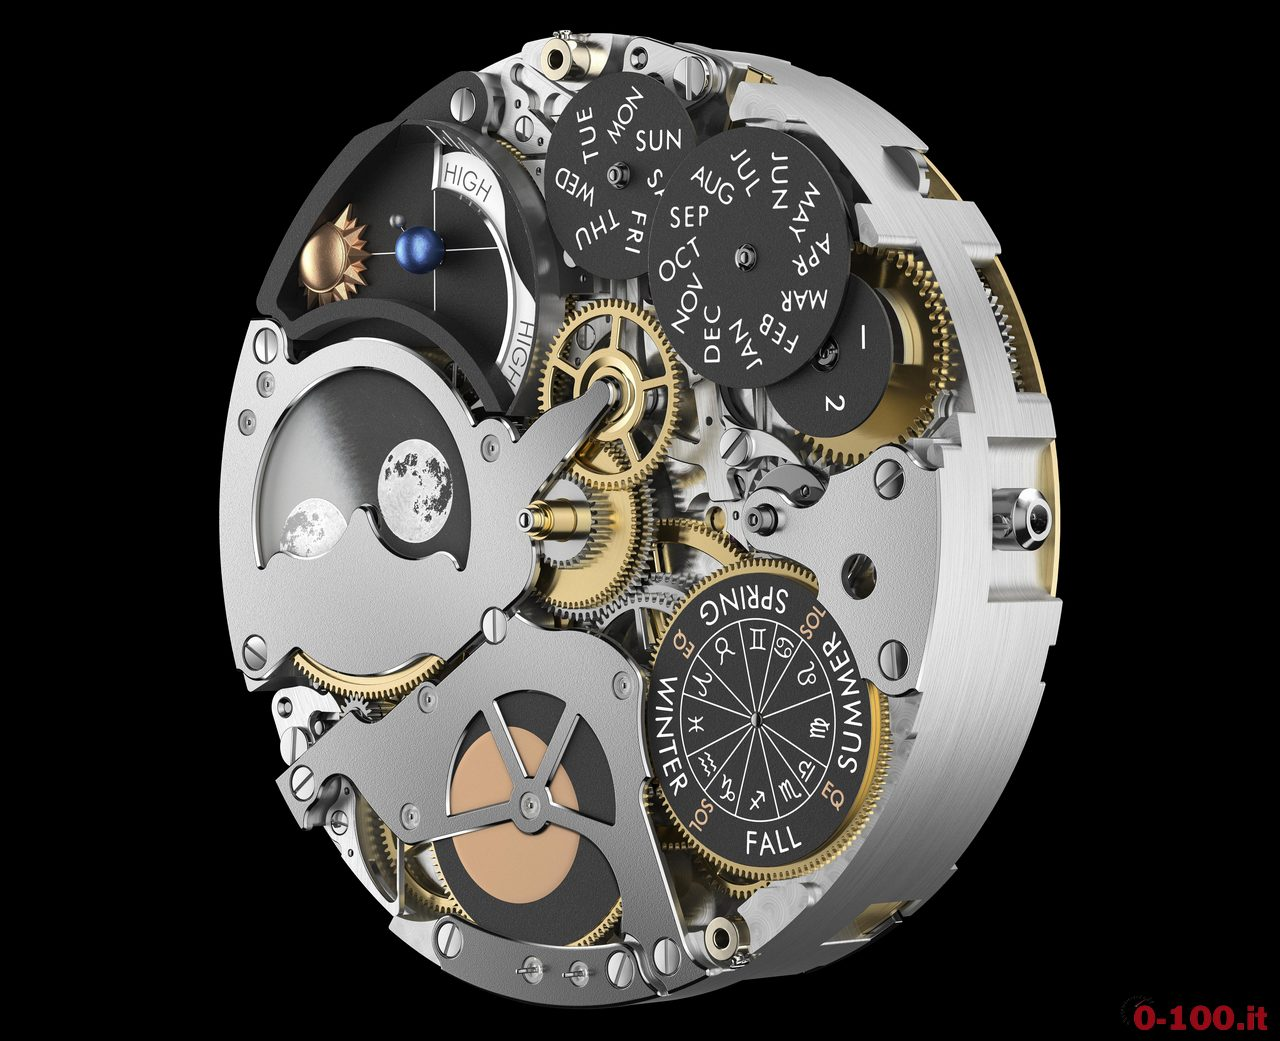 sihh-2017-vacheron-constantin-les-cabinotiers-celestia-astronomical-grand-complication-3600-rif-9720c000g-b281-prezzo-price_0-10011